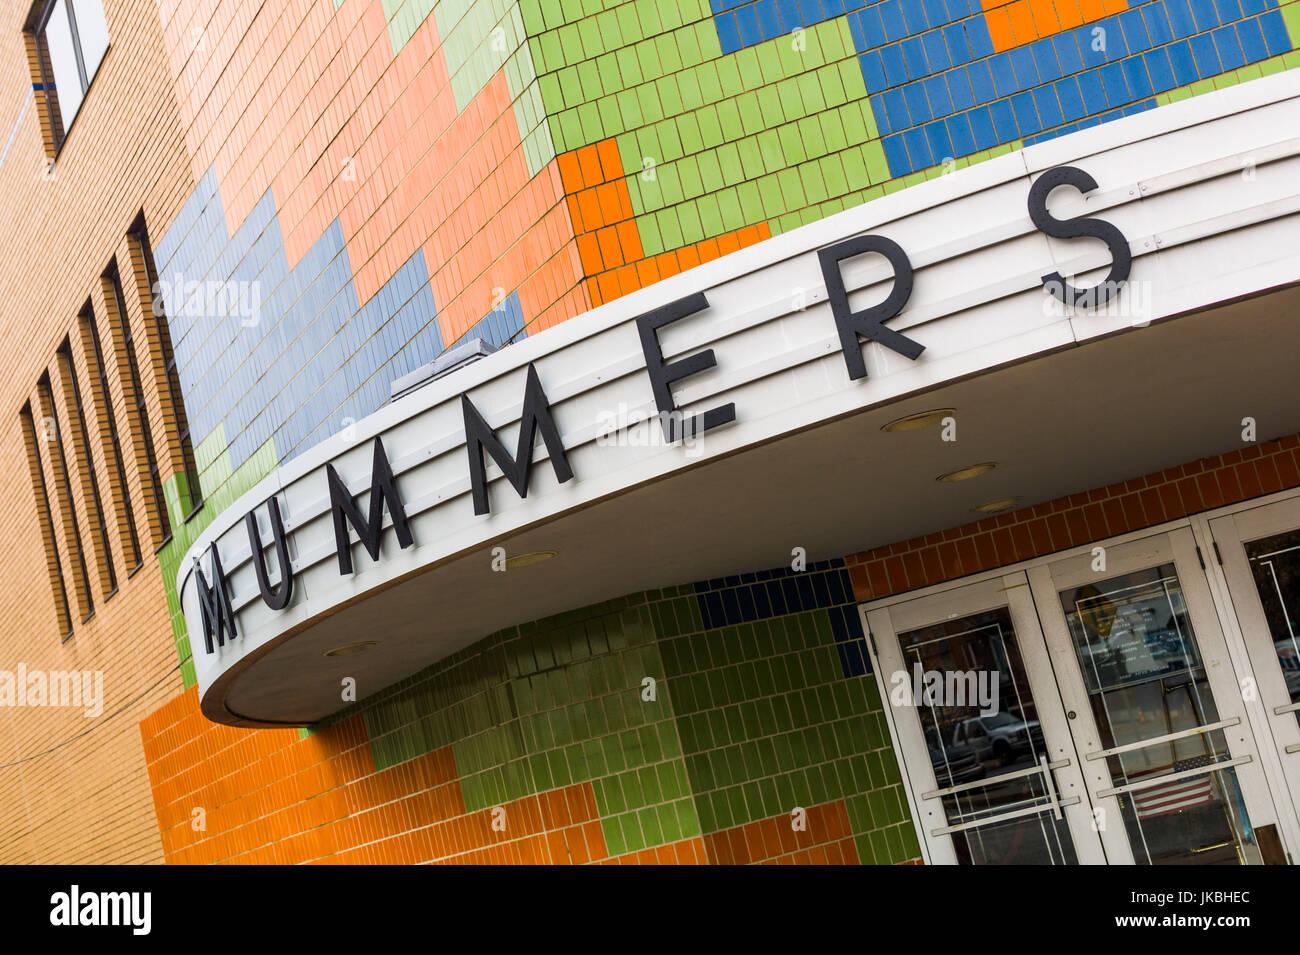 USA, Pennsylvania, Philadelphia, South Philadelphia, Mummers Museum, exterior - Stock Image